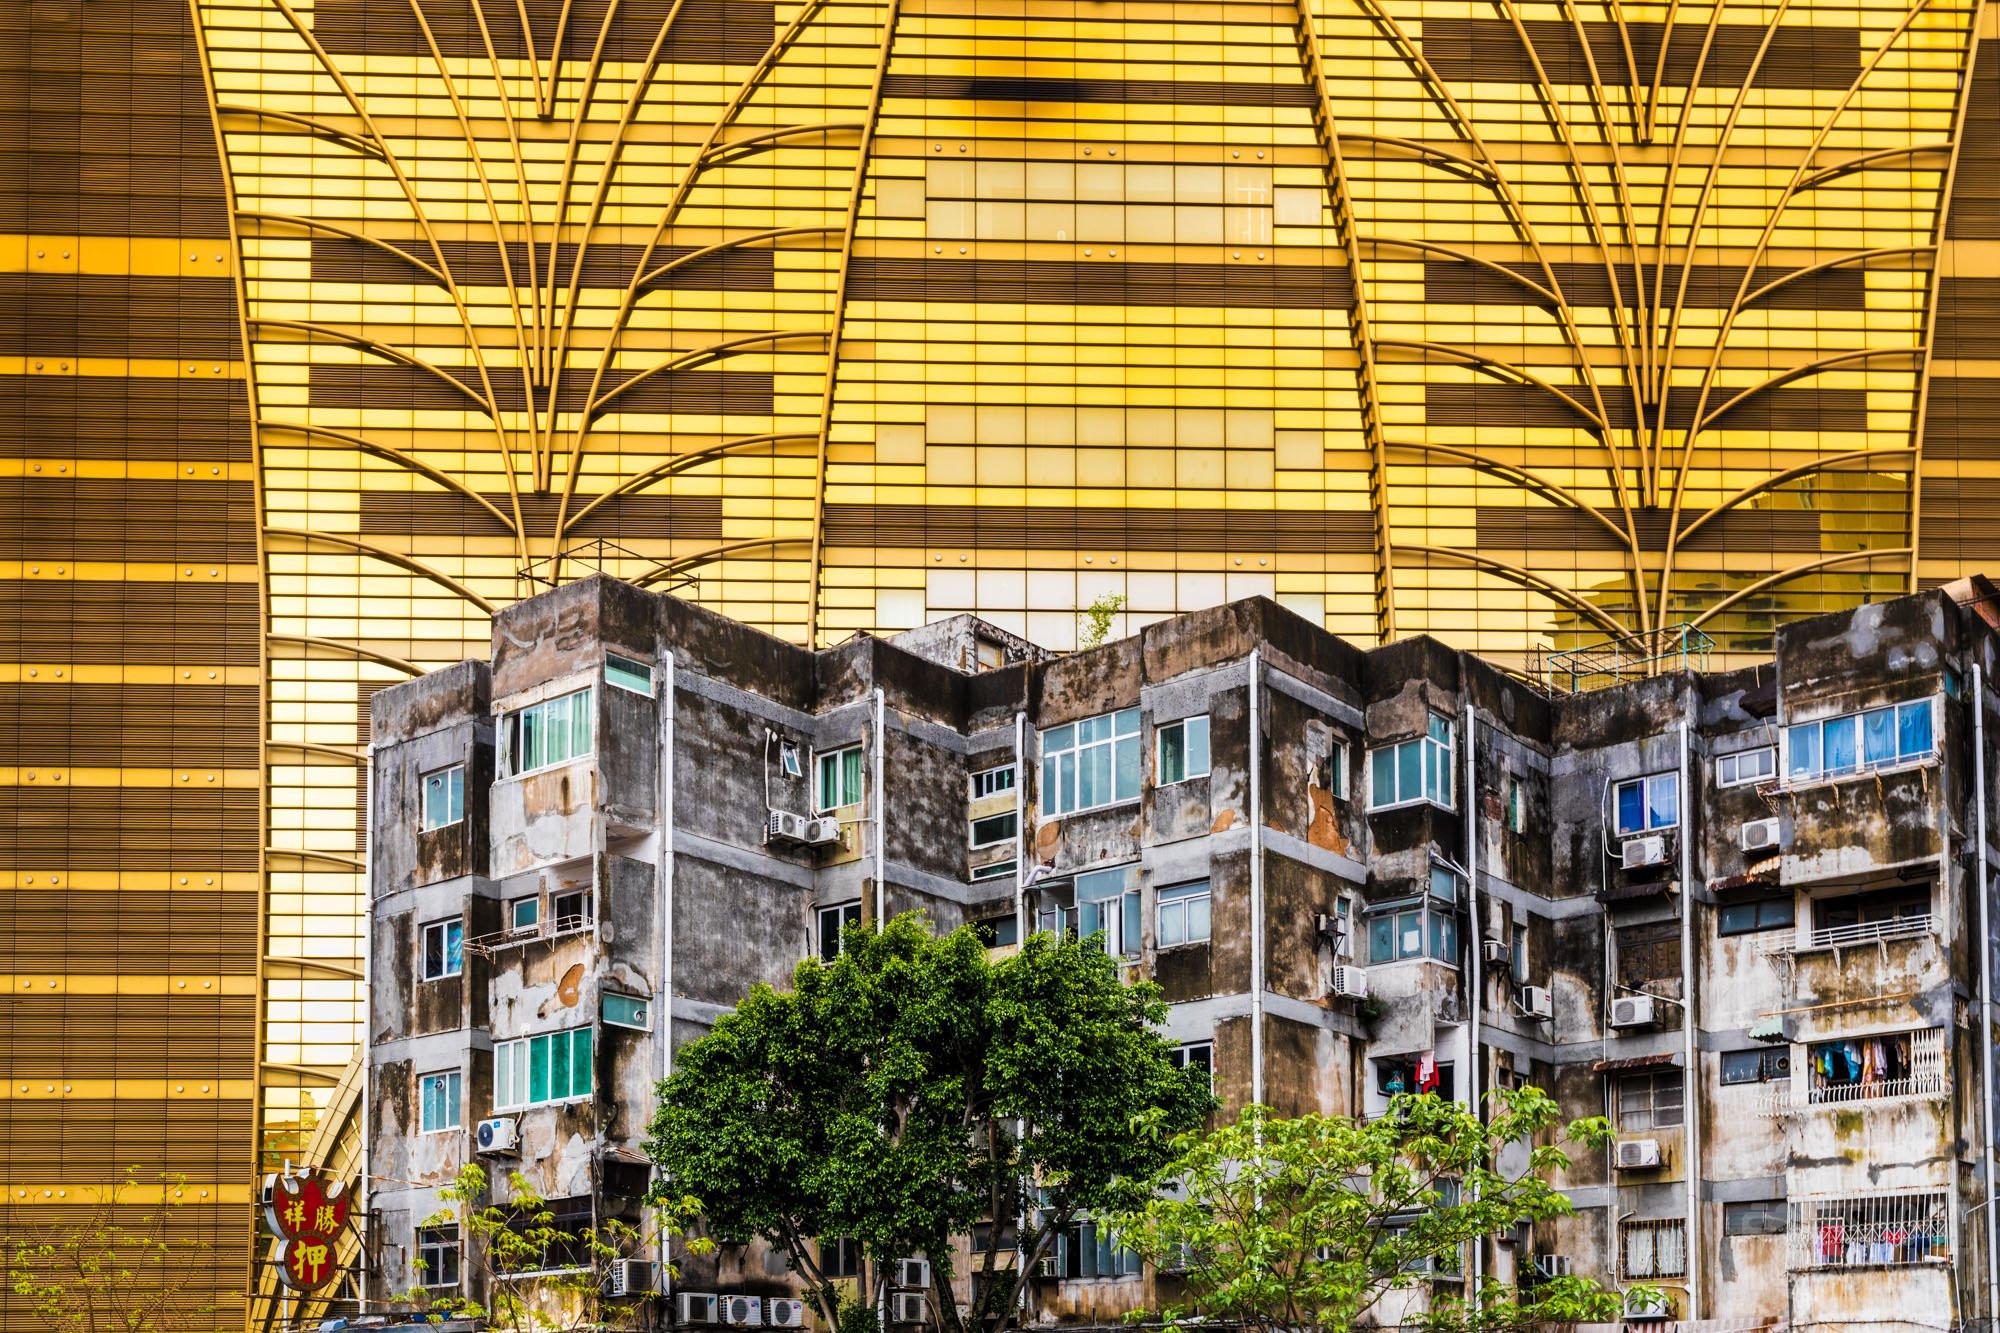 Old buildings and Lisboa Casino, Macao China